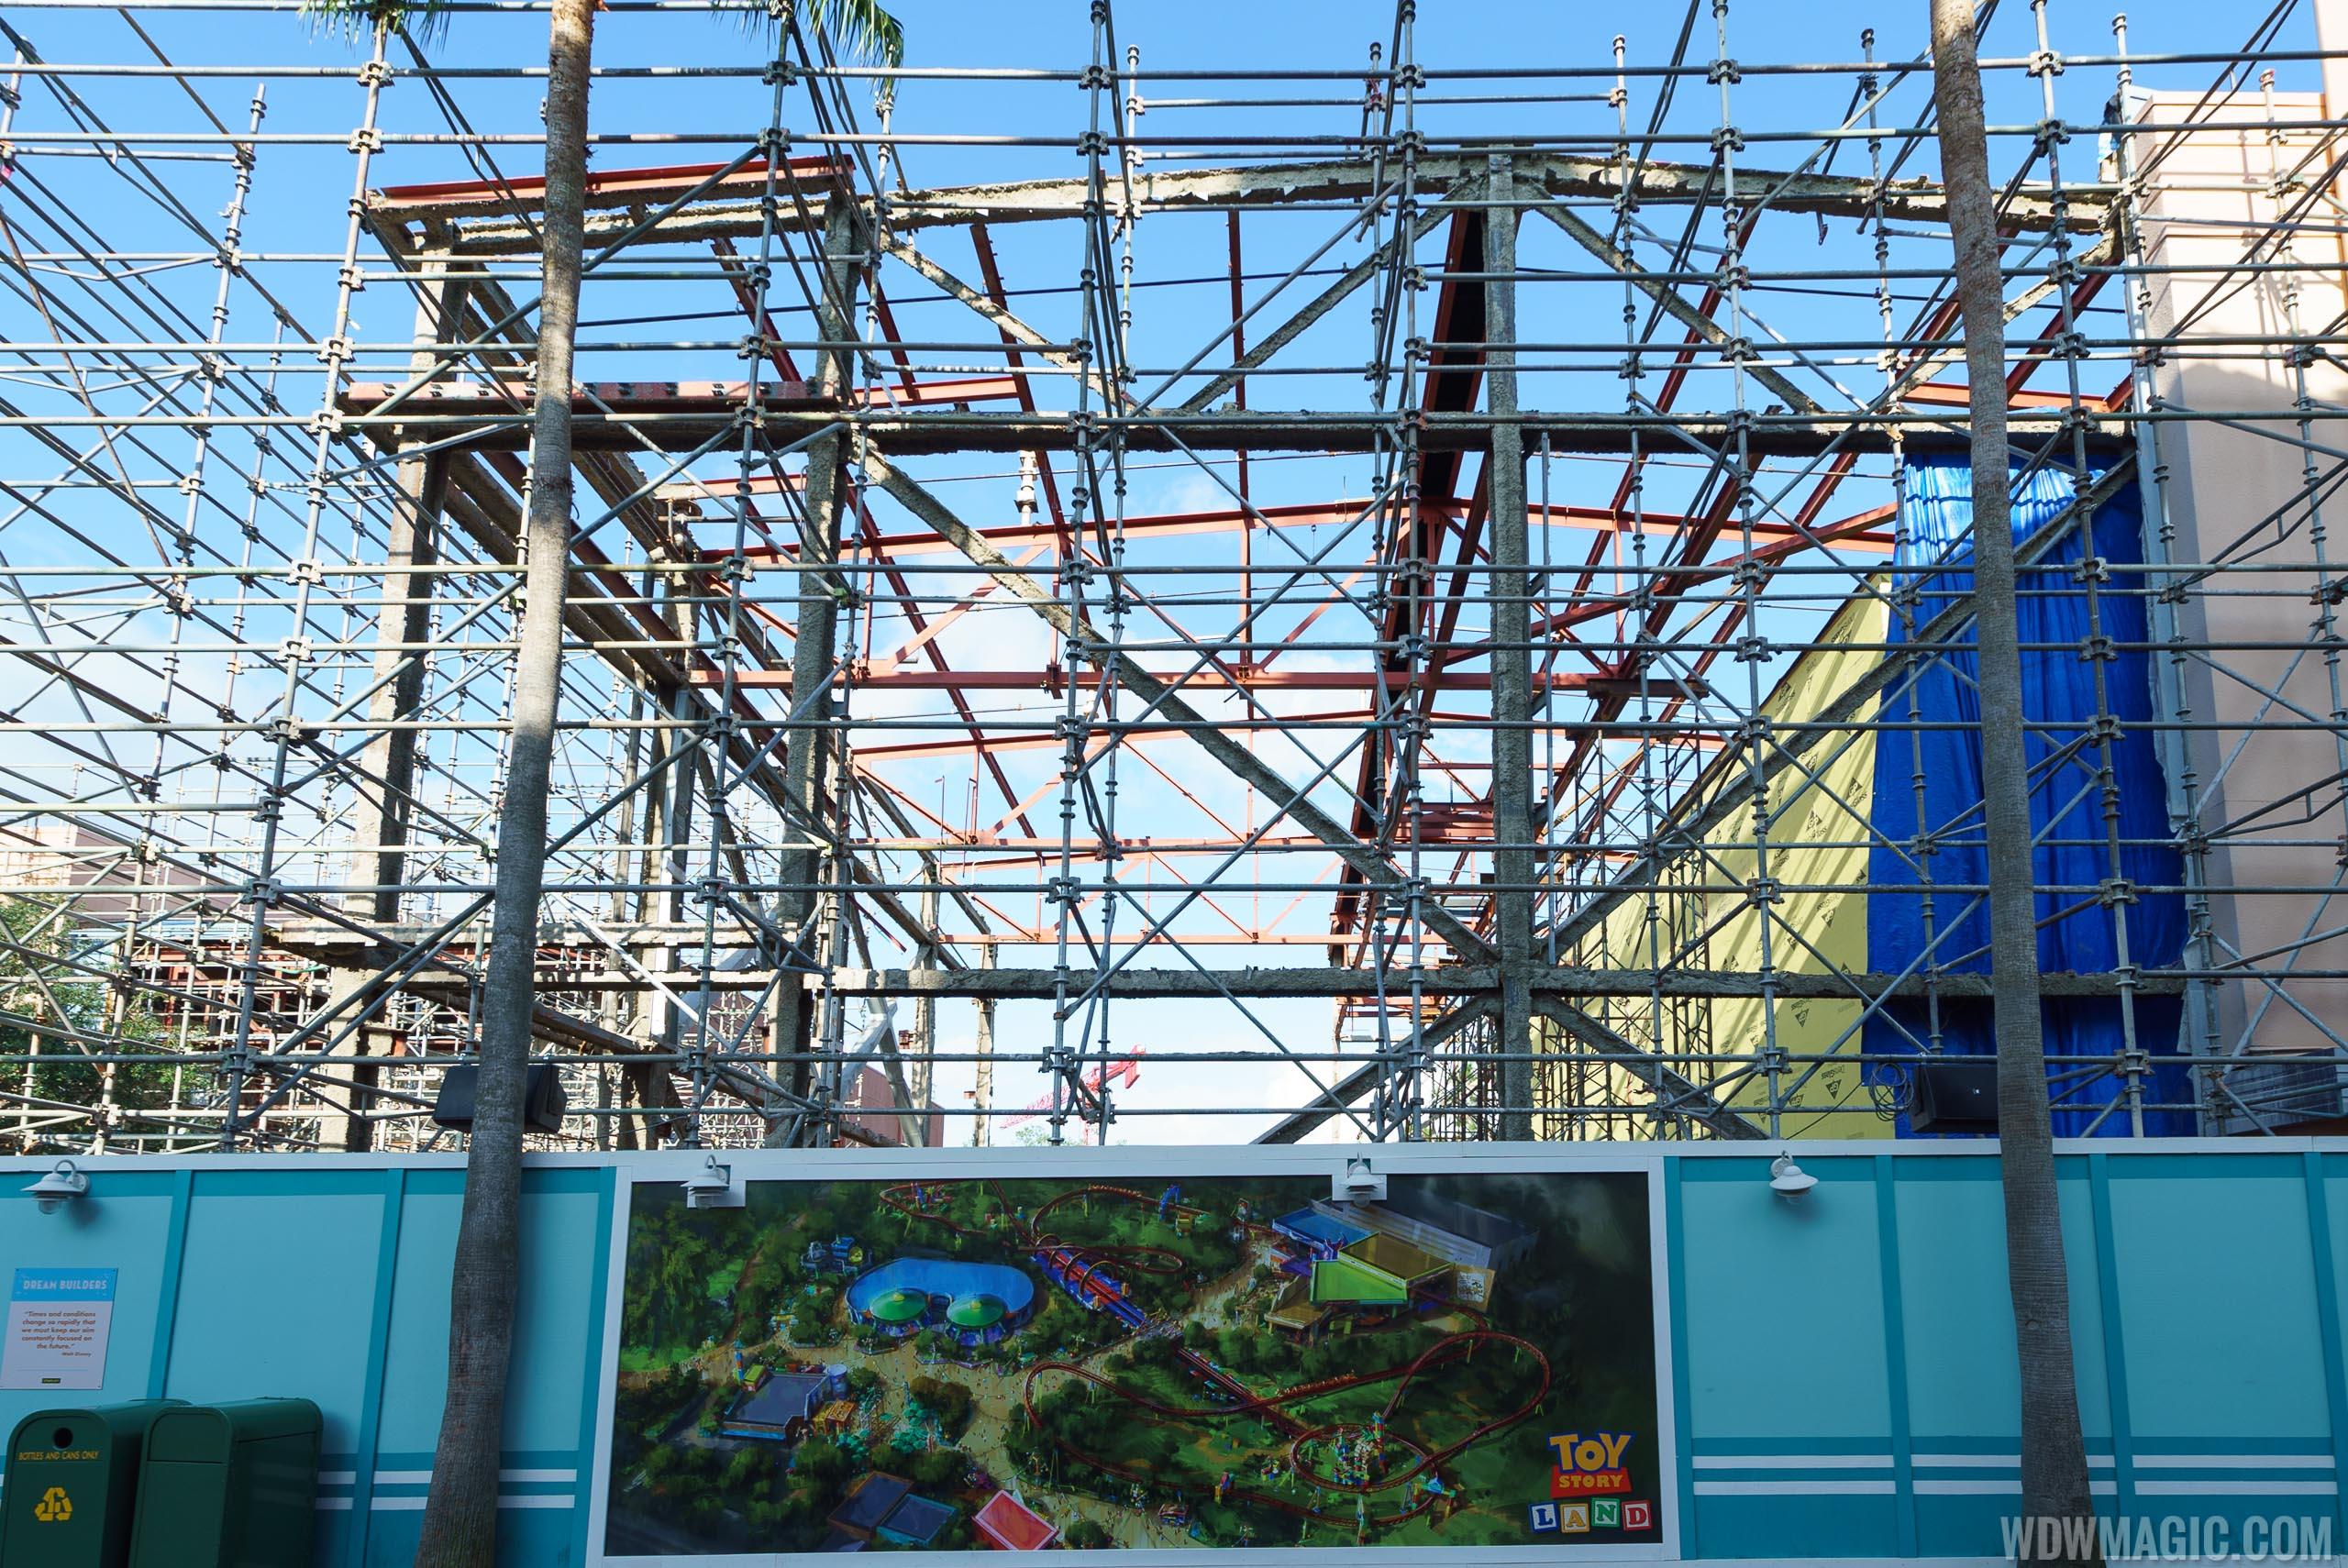 Toy Story Land entrance Soundstage 4 demolition